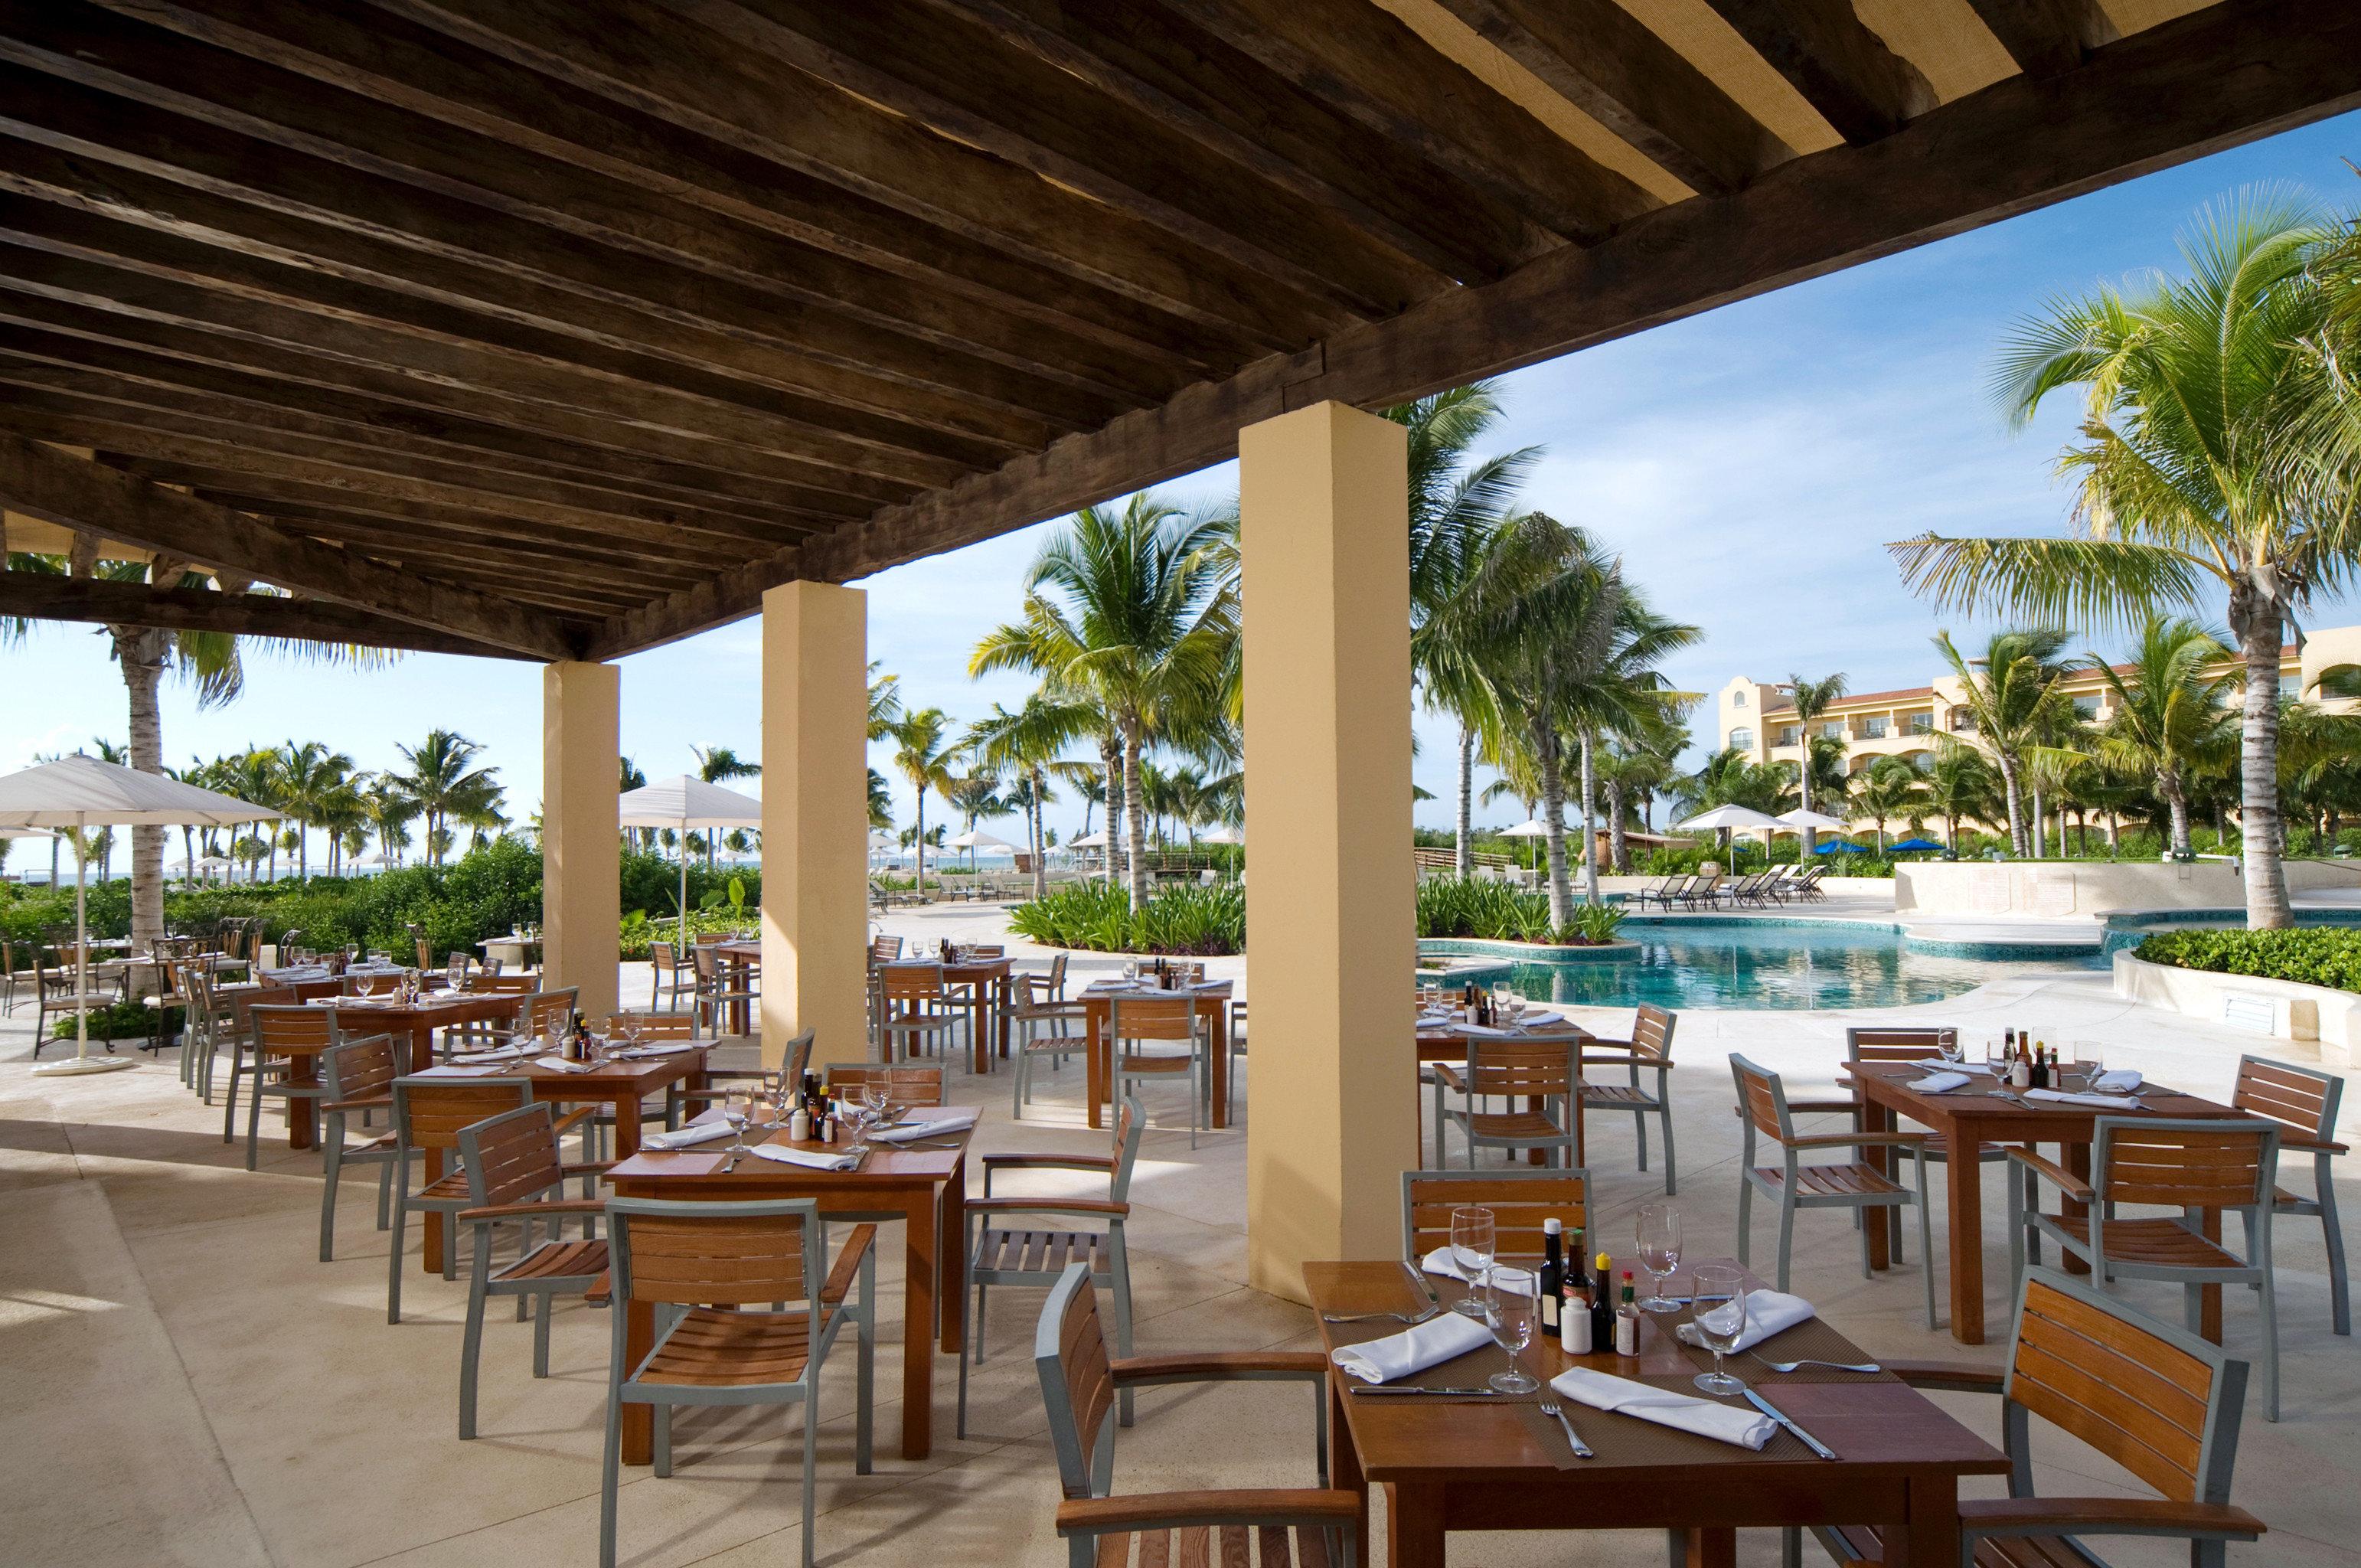 Bar Beachfront Dining Drink Eat Luxury chair building property Resort restaurant porch Villa Deck